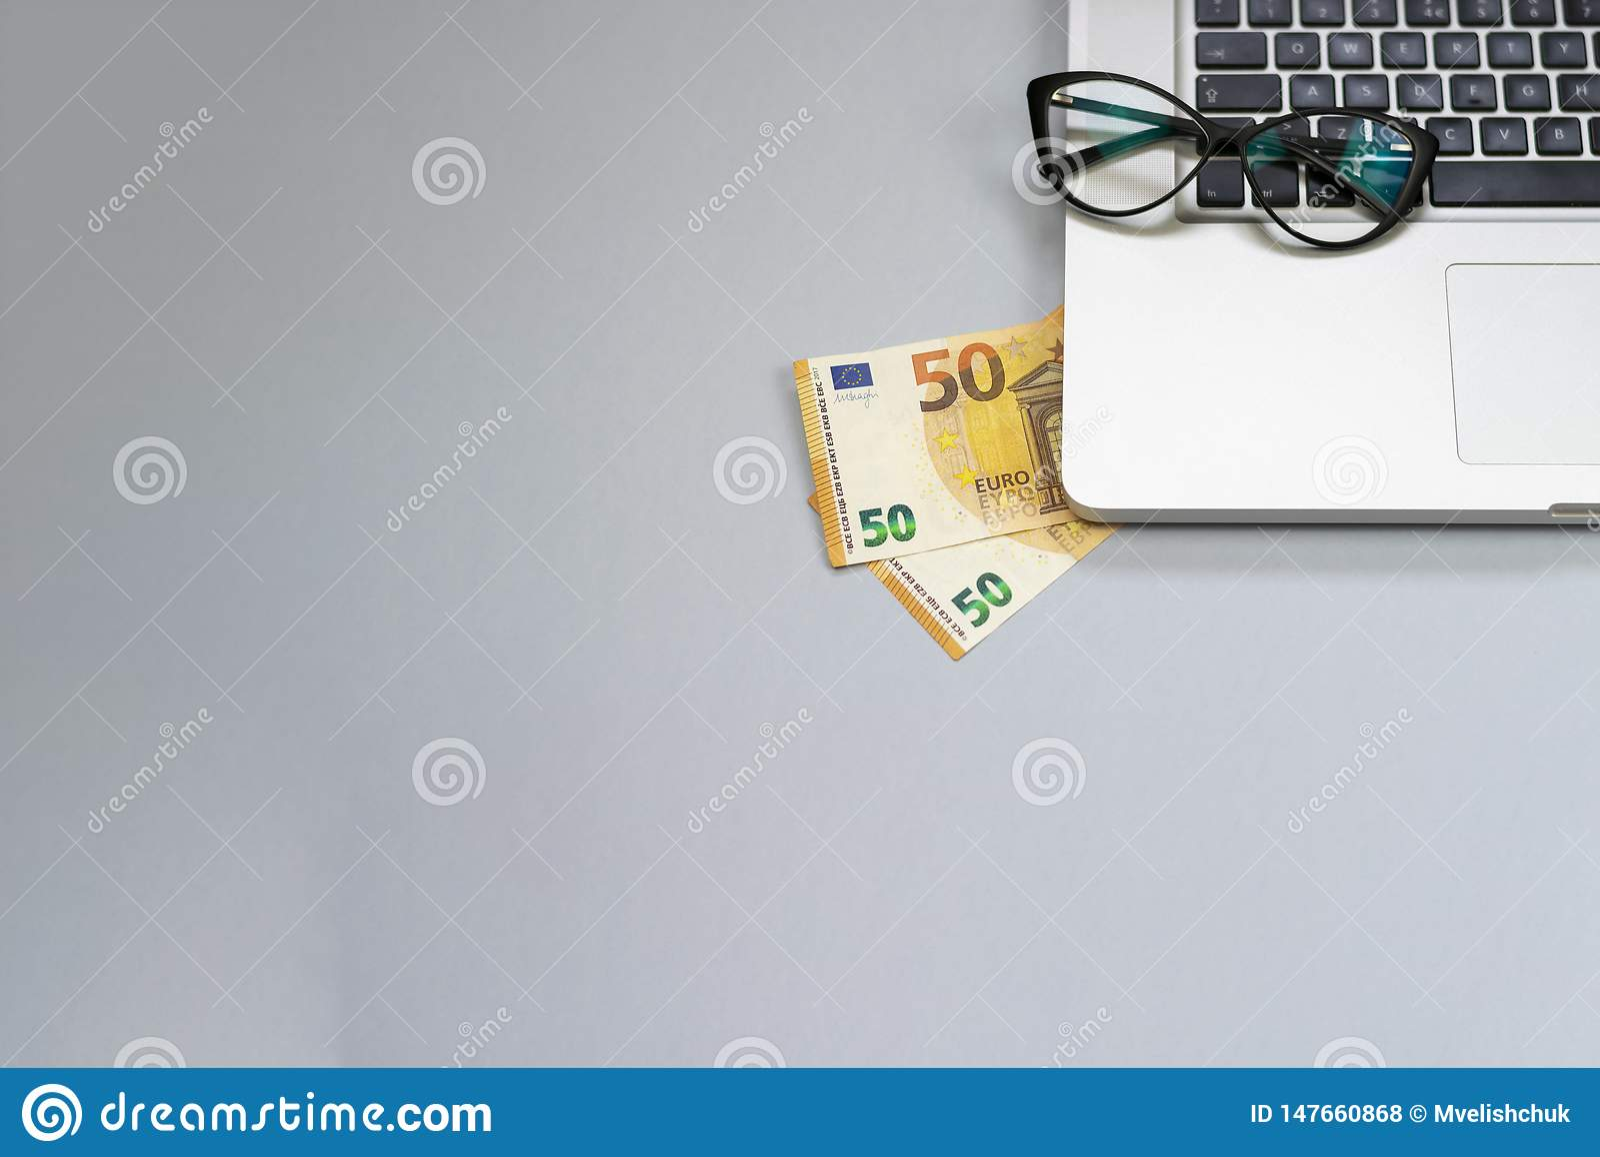 desk with money, laptop, glasses